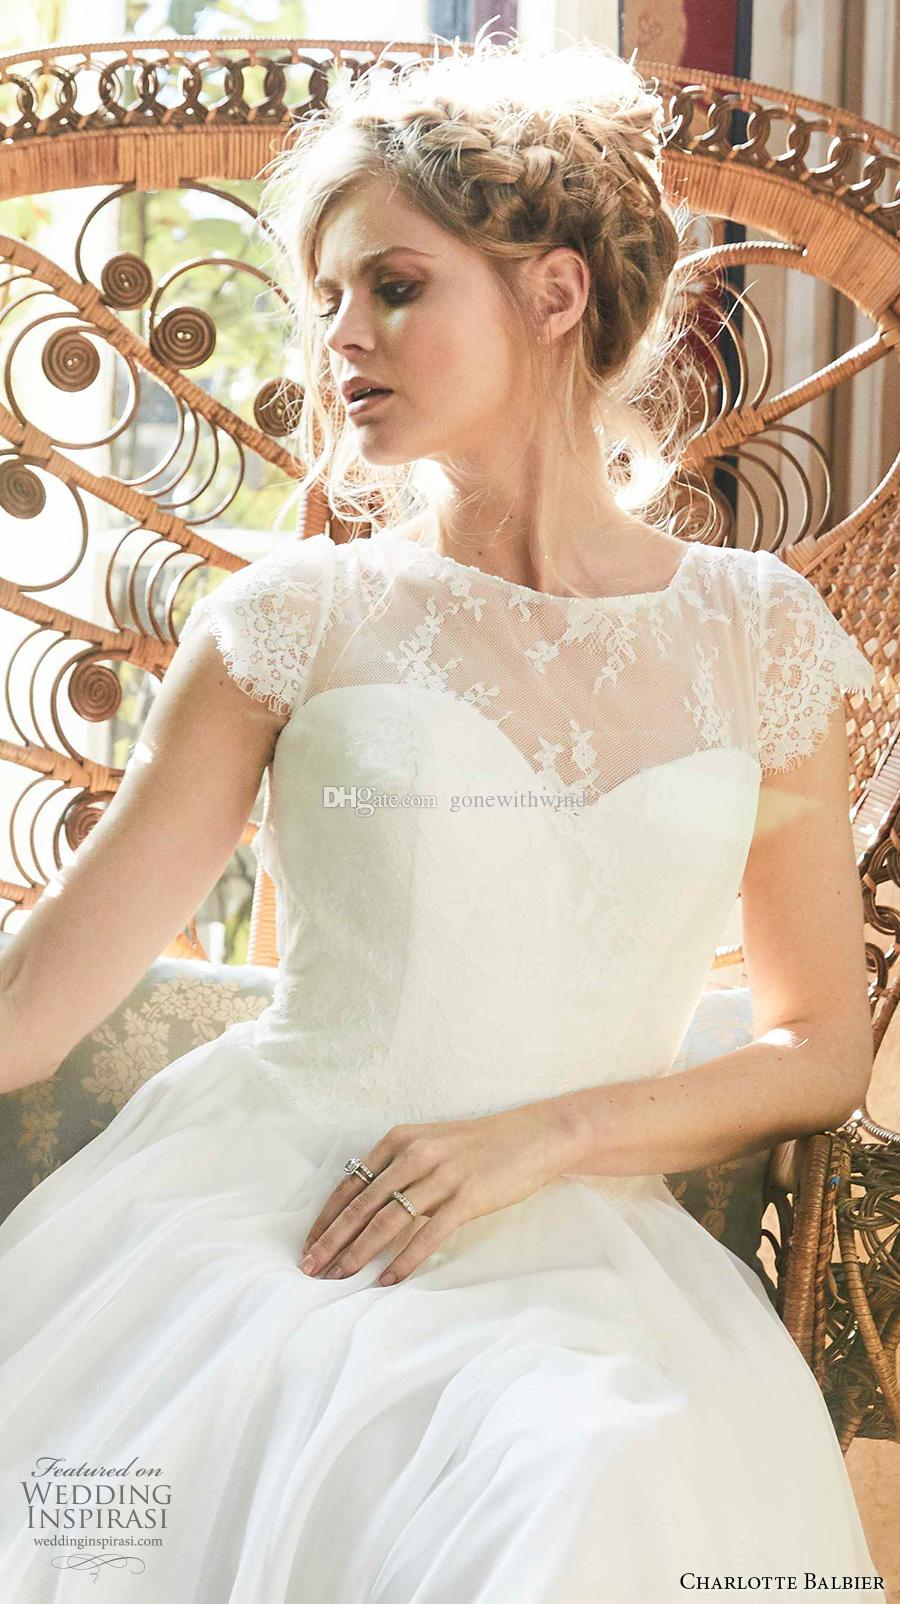 romantic bohemian wedding dresses 2018 charlotte balbier bridal cap sleeves illusion jewel sweetheart neckline short train